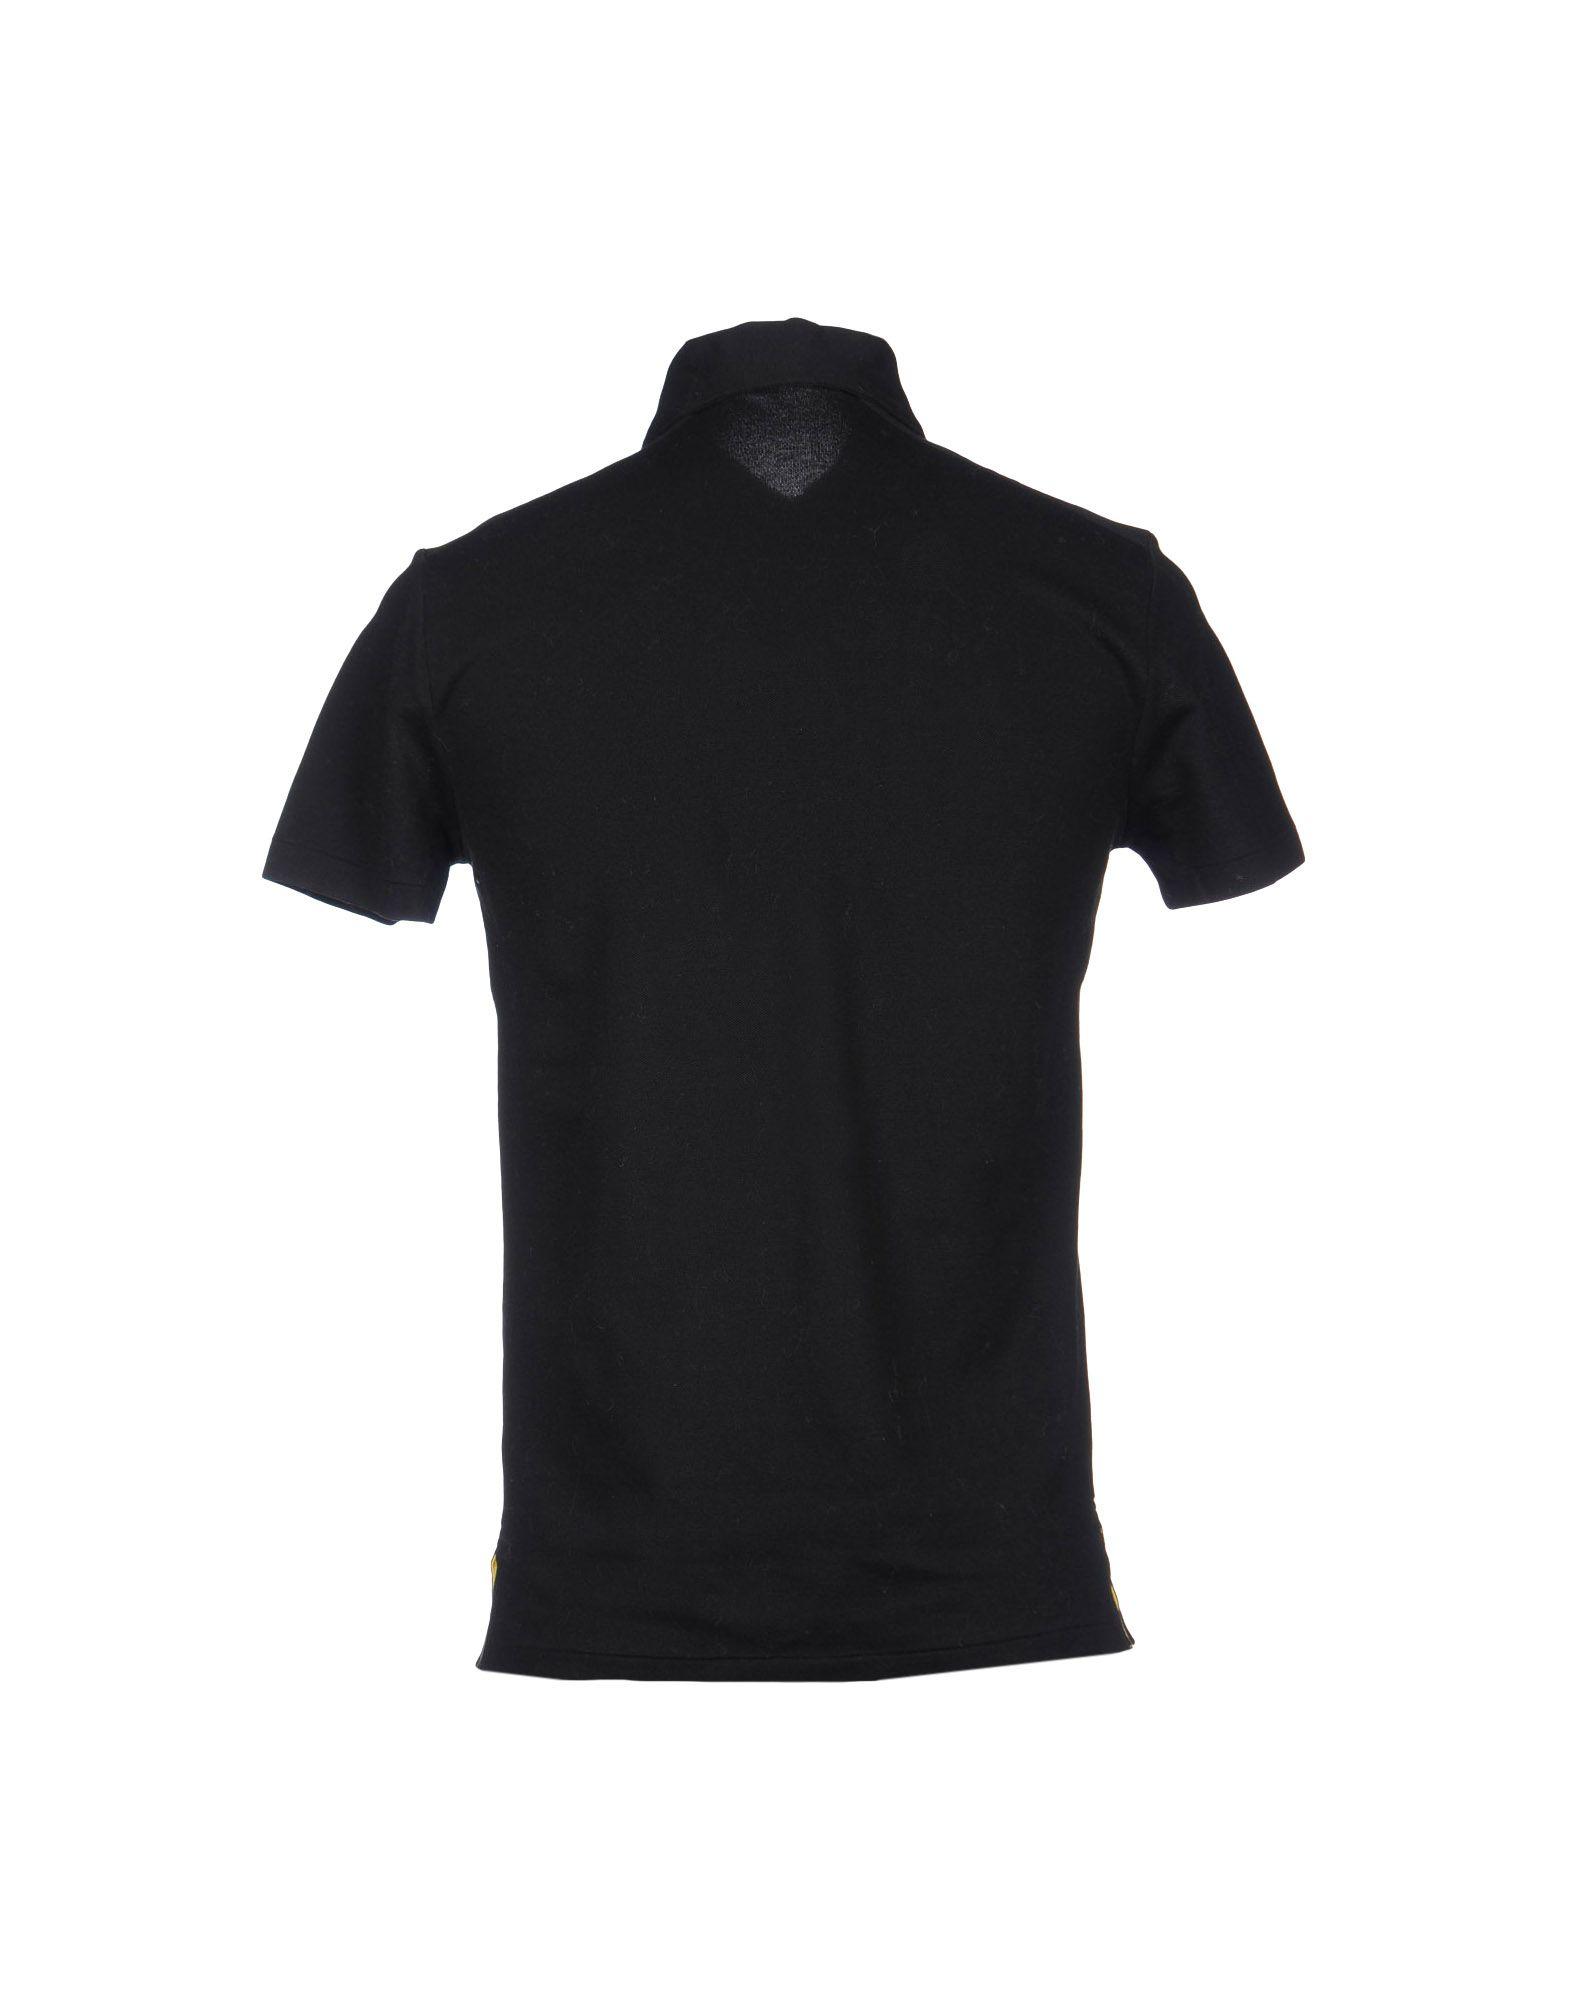 Ralph lauren black label polo shirt in black for men lyst for Ralph lauren black label polo shirt